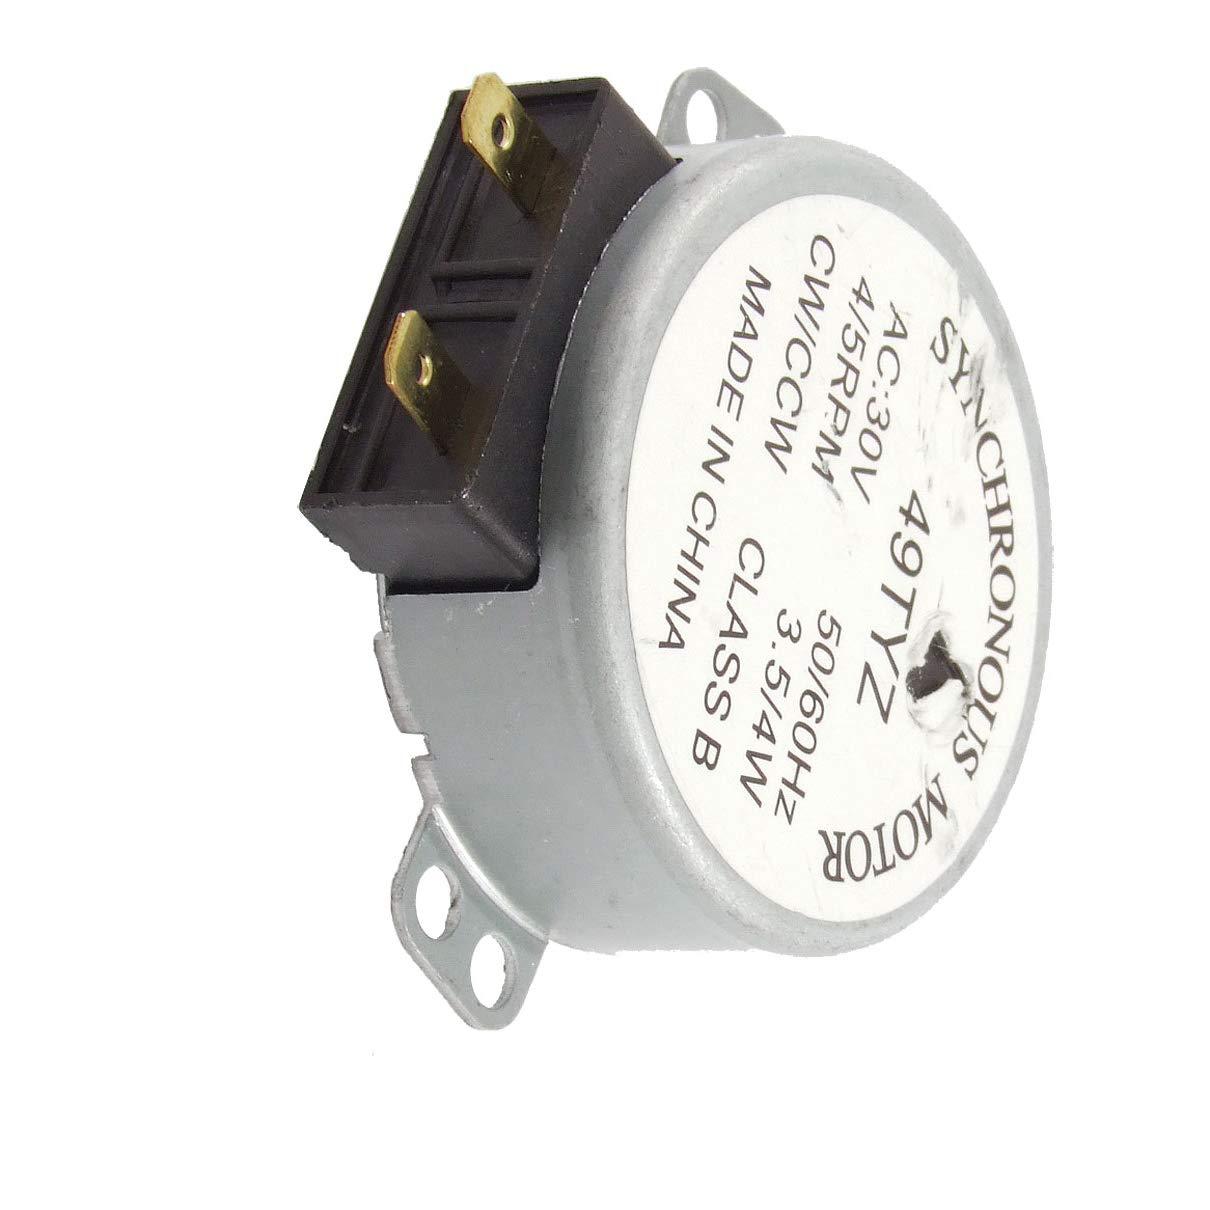 Aexit AC 30V 3.5 / 4W 4 / 5RPM síncrono para (model: R7738VIIII ...